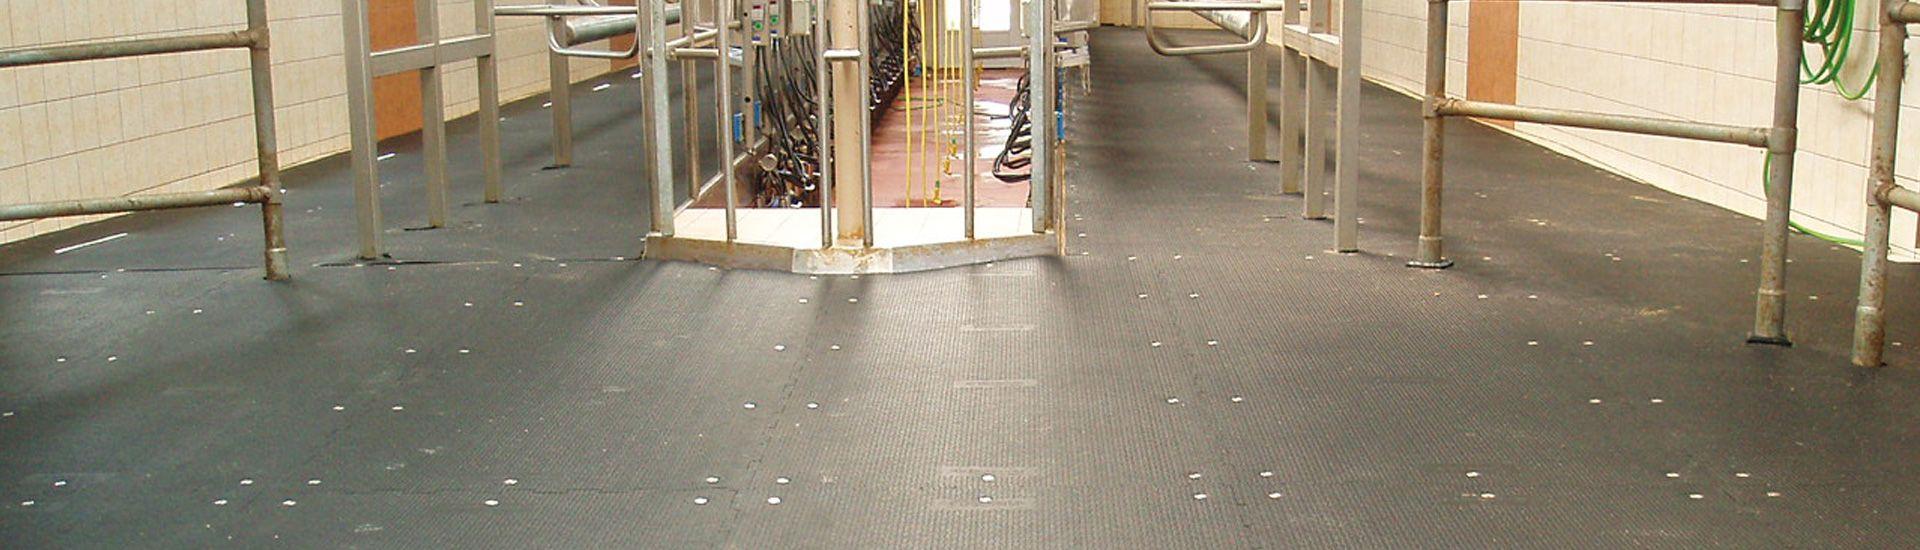 KRAIBURG rubber floorings for walking areas without scraper in dairy housing